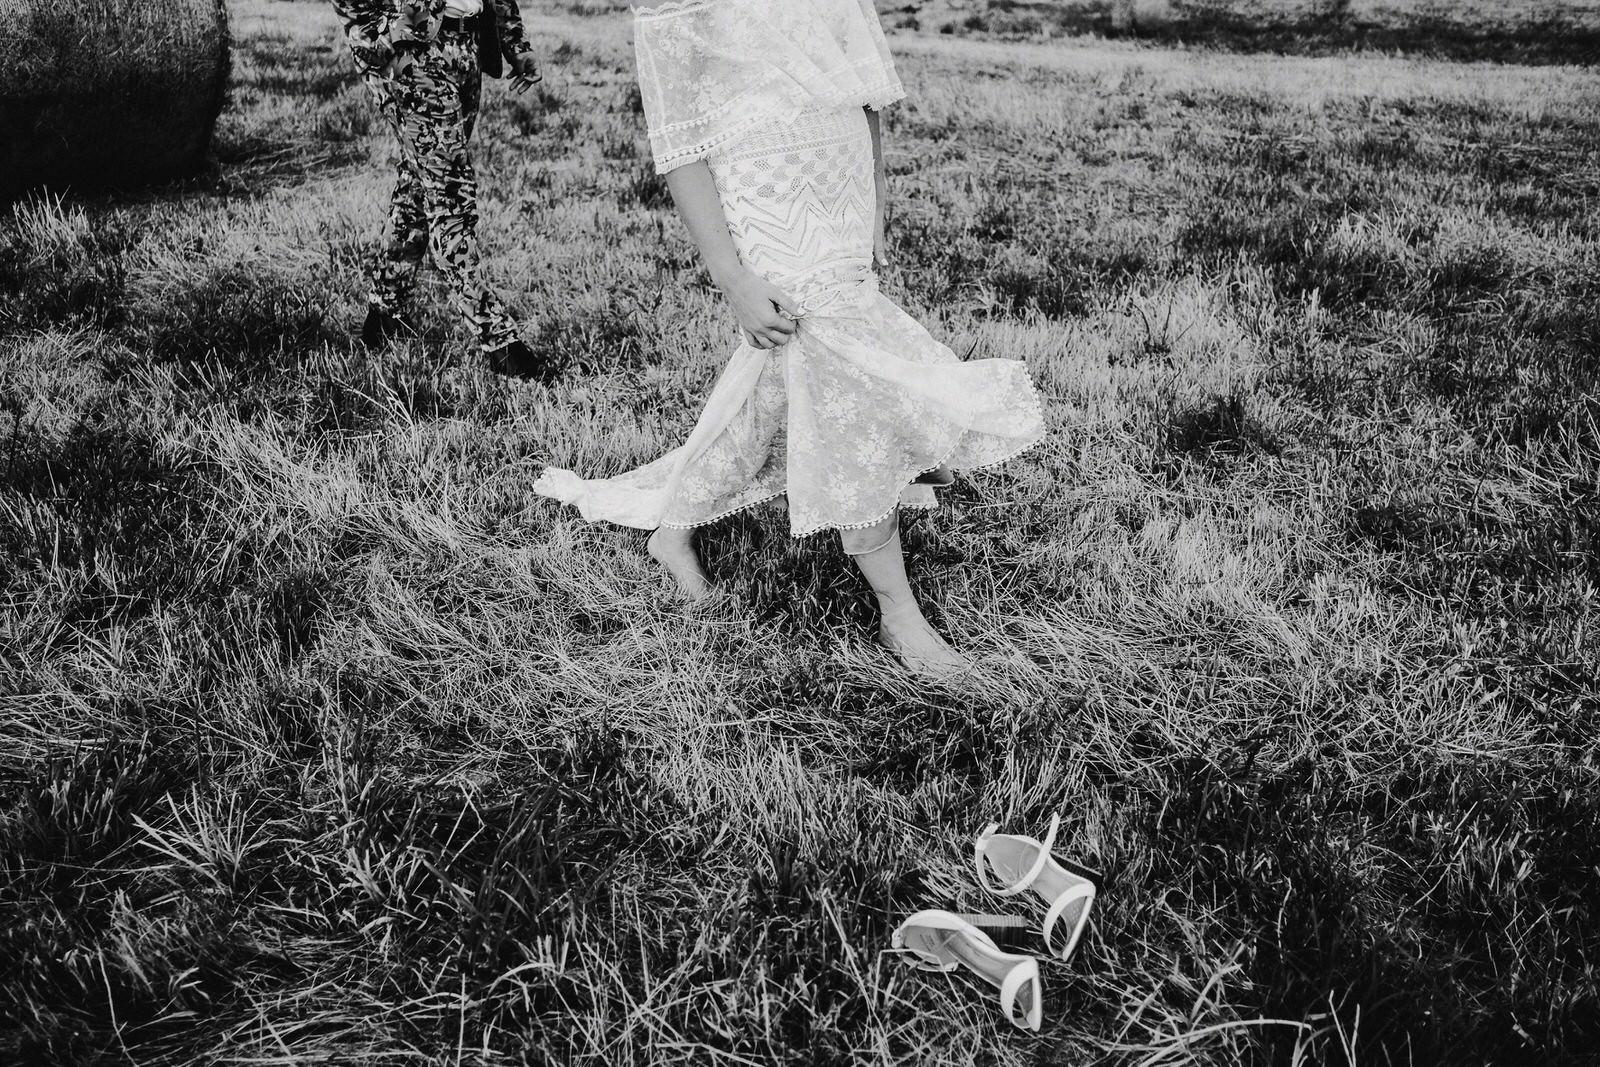 Wairarapa-Wedding_The-Landing_003.JPG